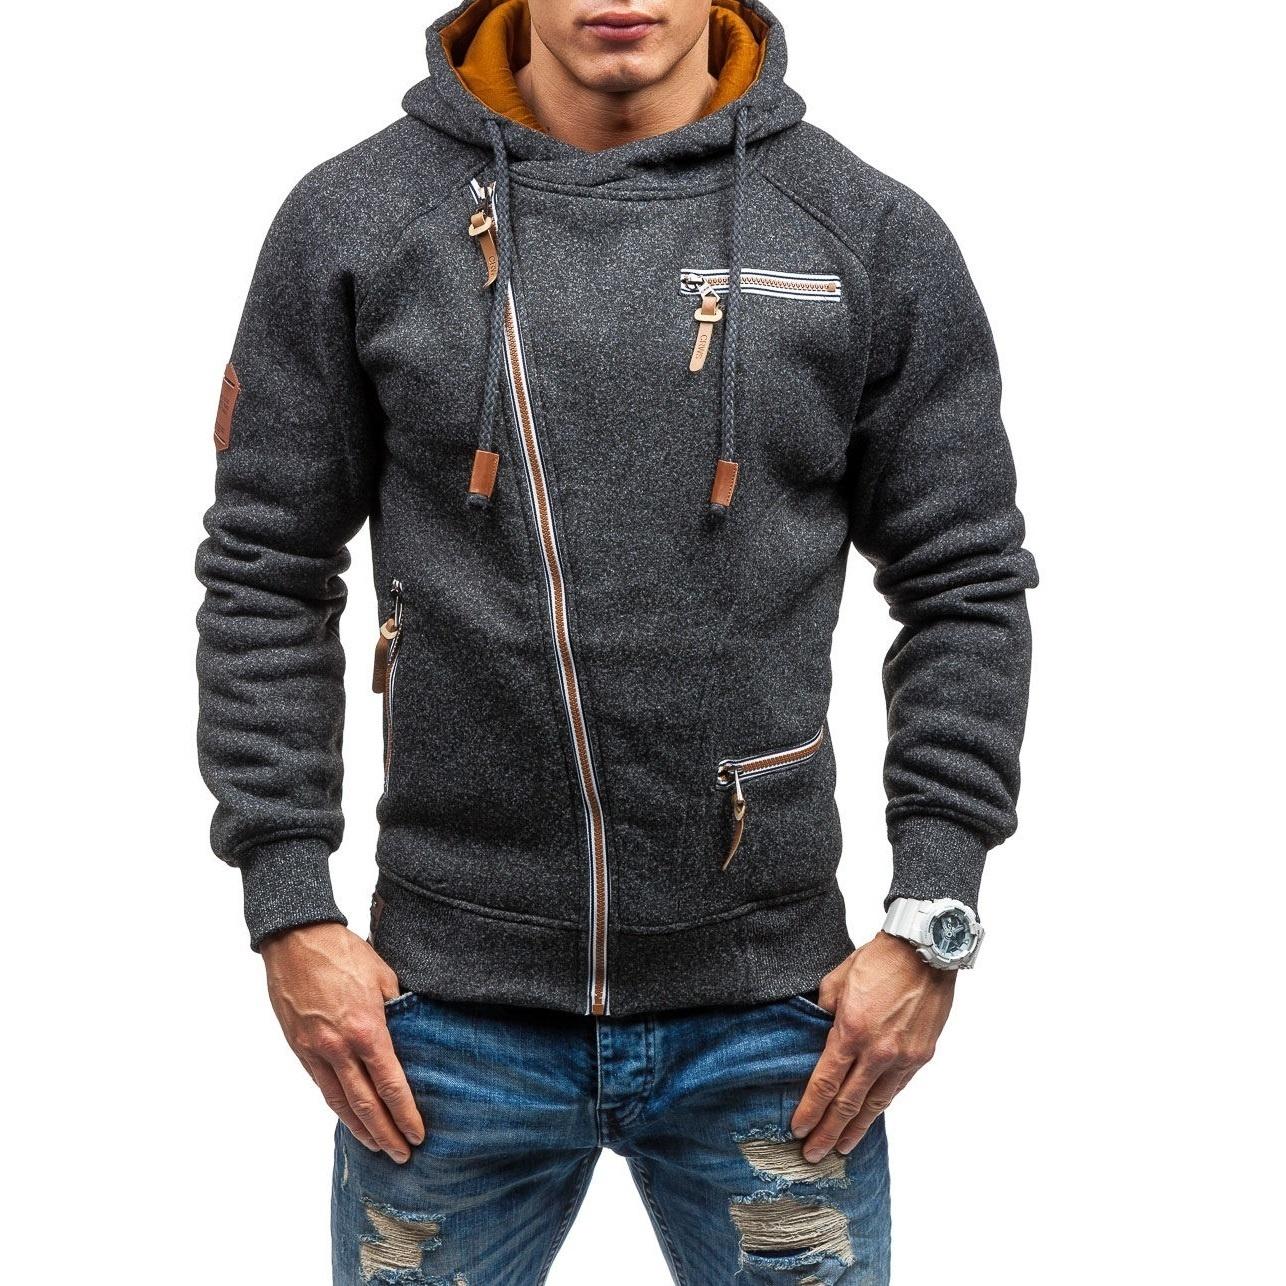 HTB1rX9IXN2rK1RkSnhJq6ykdpXat - Men Hoodies Sweatshirt 2019 Spring New Unique Diagonal Zipper Fashion Simple Loose Casual Hooded Streetwear Men Tracksuits Coat